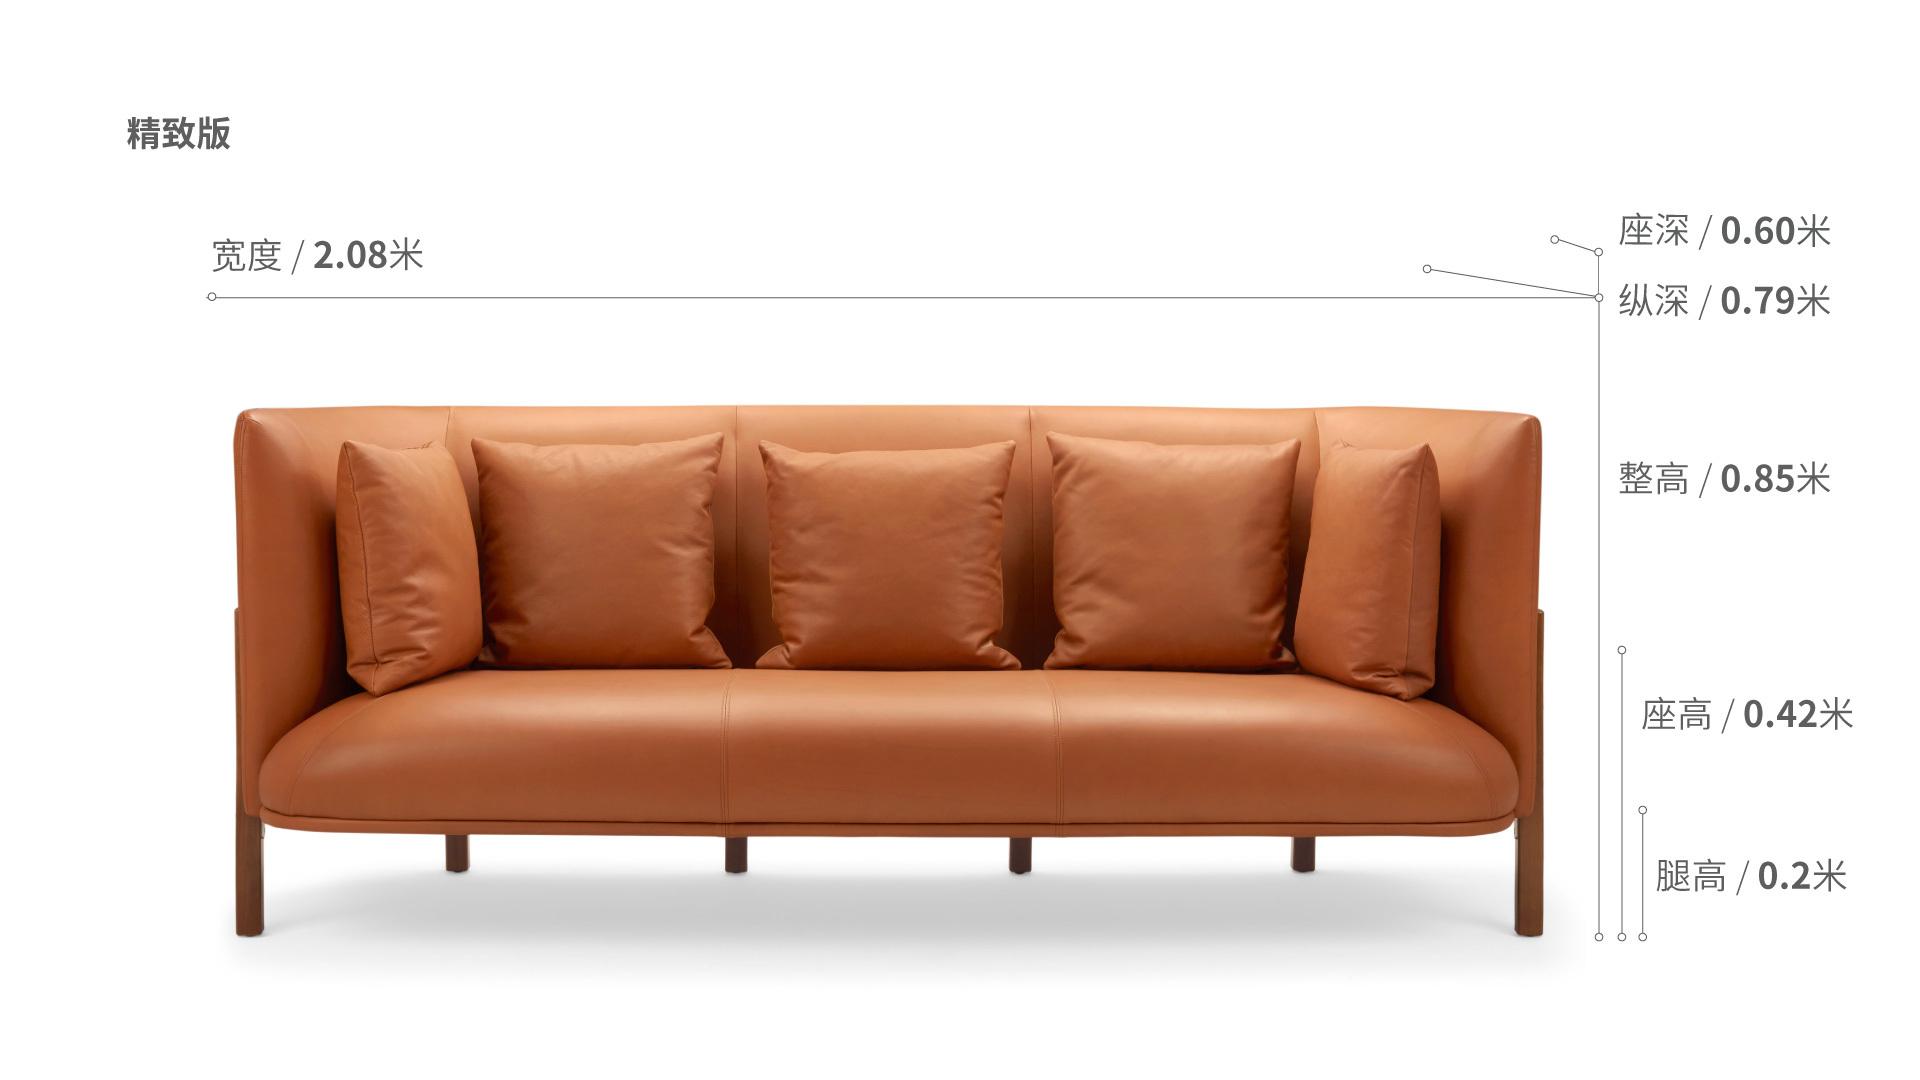 COFA L®精致版三人座沙发效果图